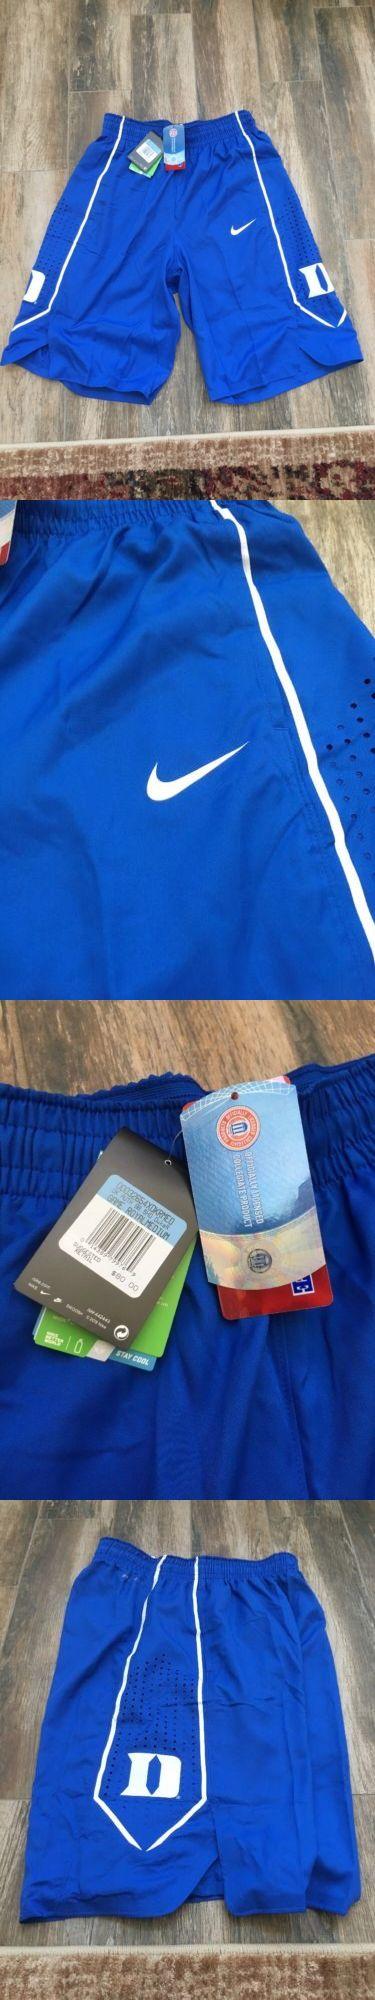 Men 158965: Nwt $80 Duke Basketball Shorts Nike Drifit Medium -> BUY IT NOW ONLY: $55 on eBay!